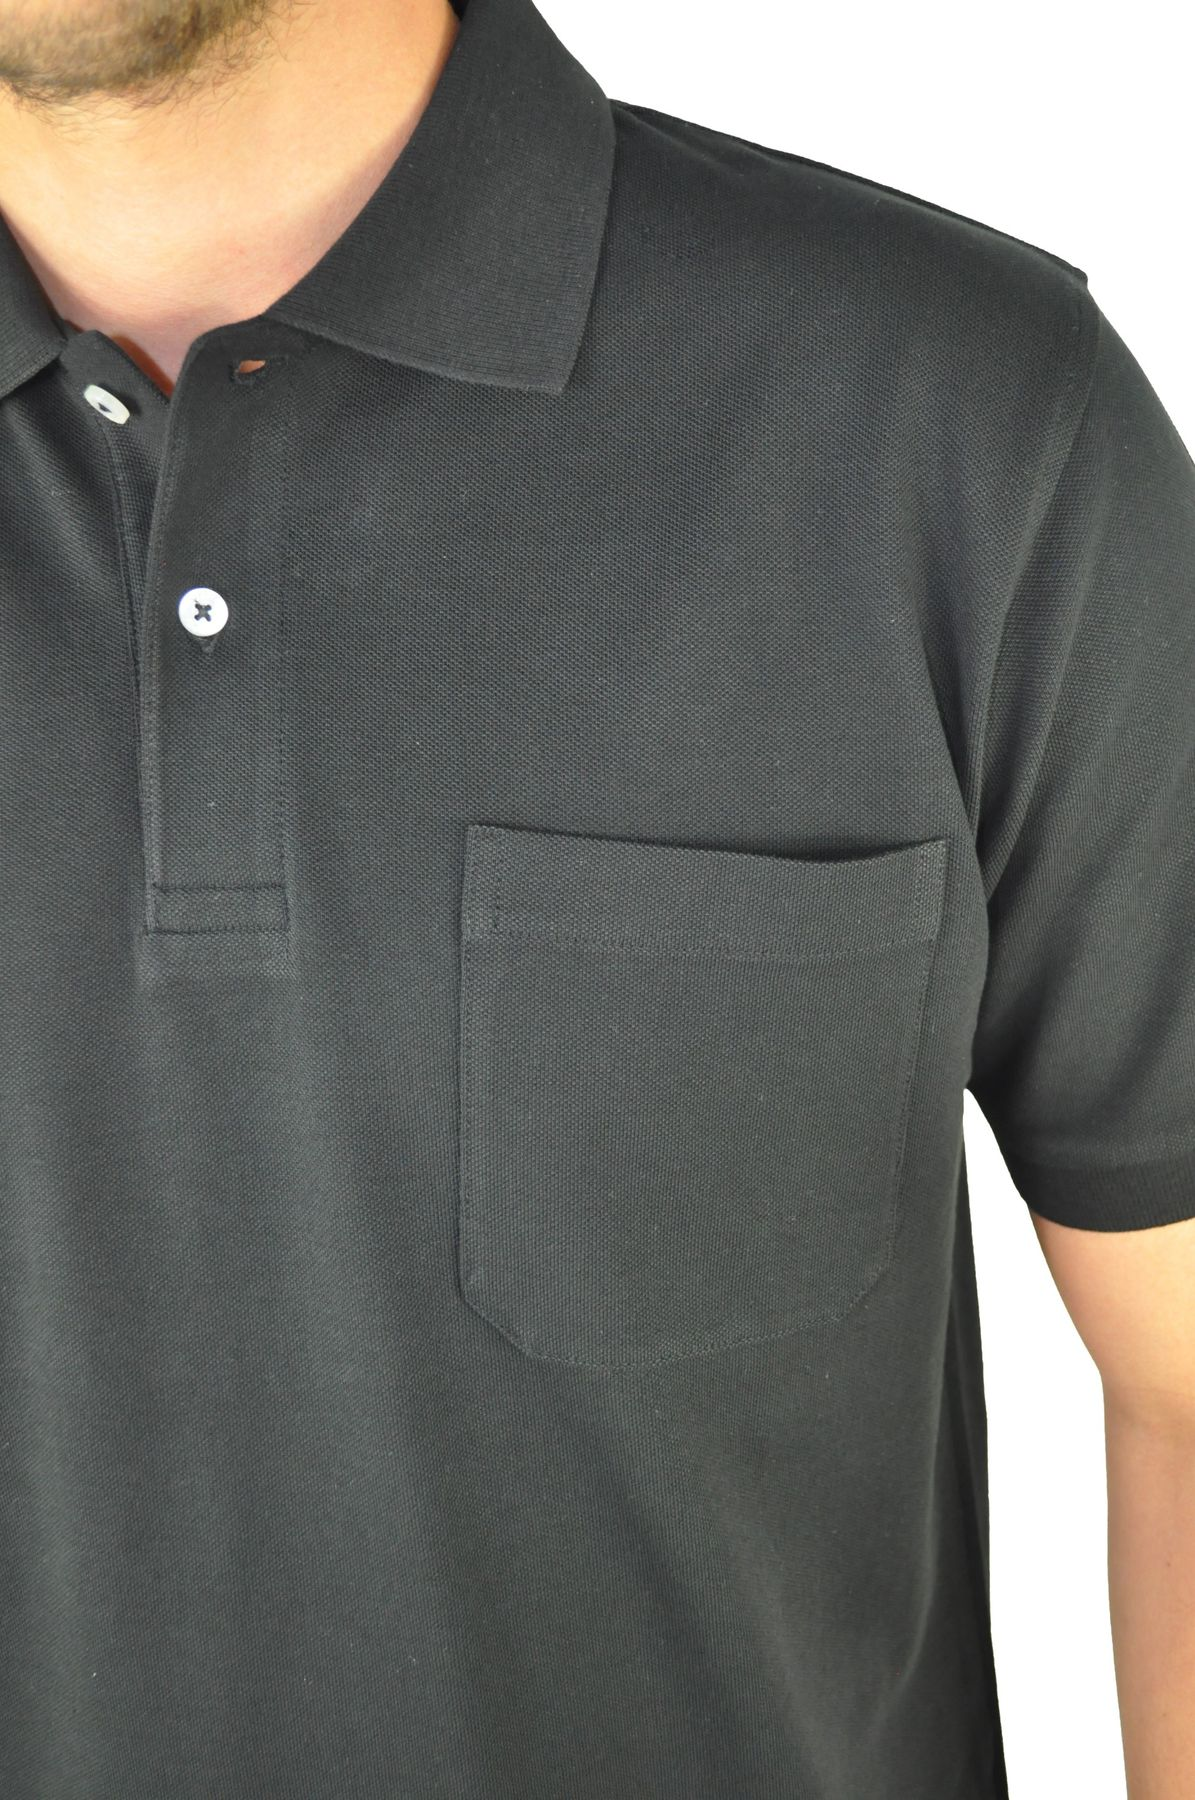 KITARO - Herren Poloshirt in verschiedenen Farben (68800) – Bild 3